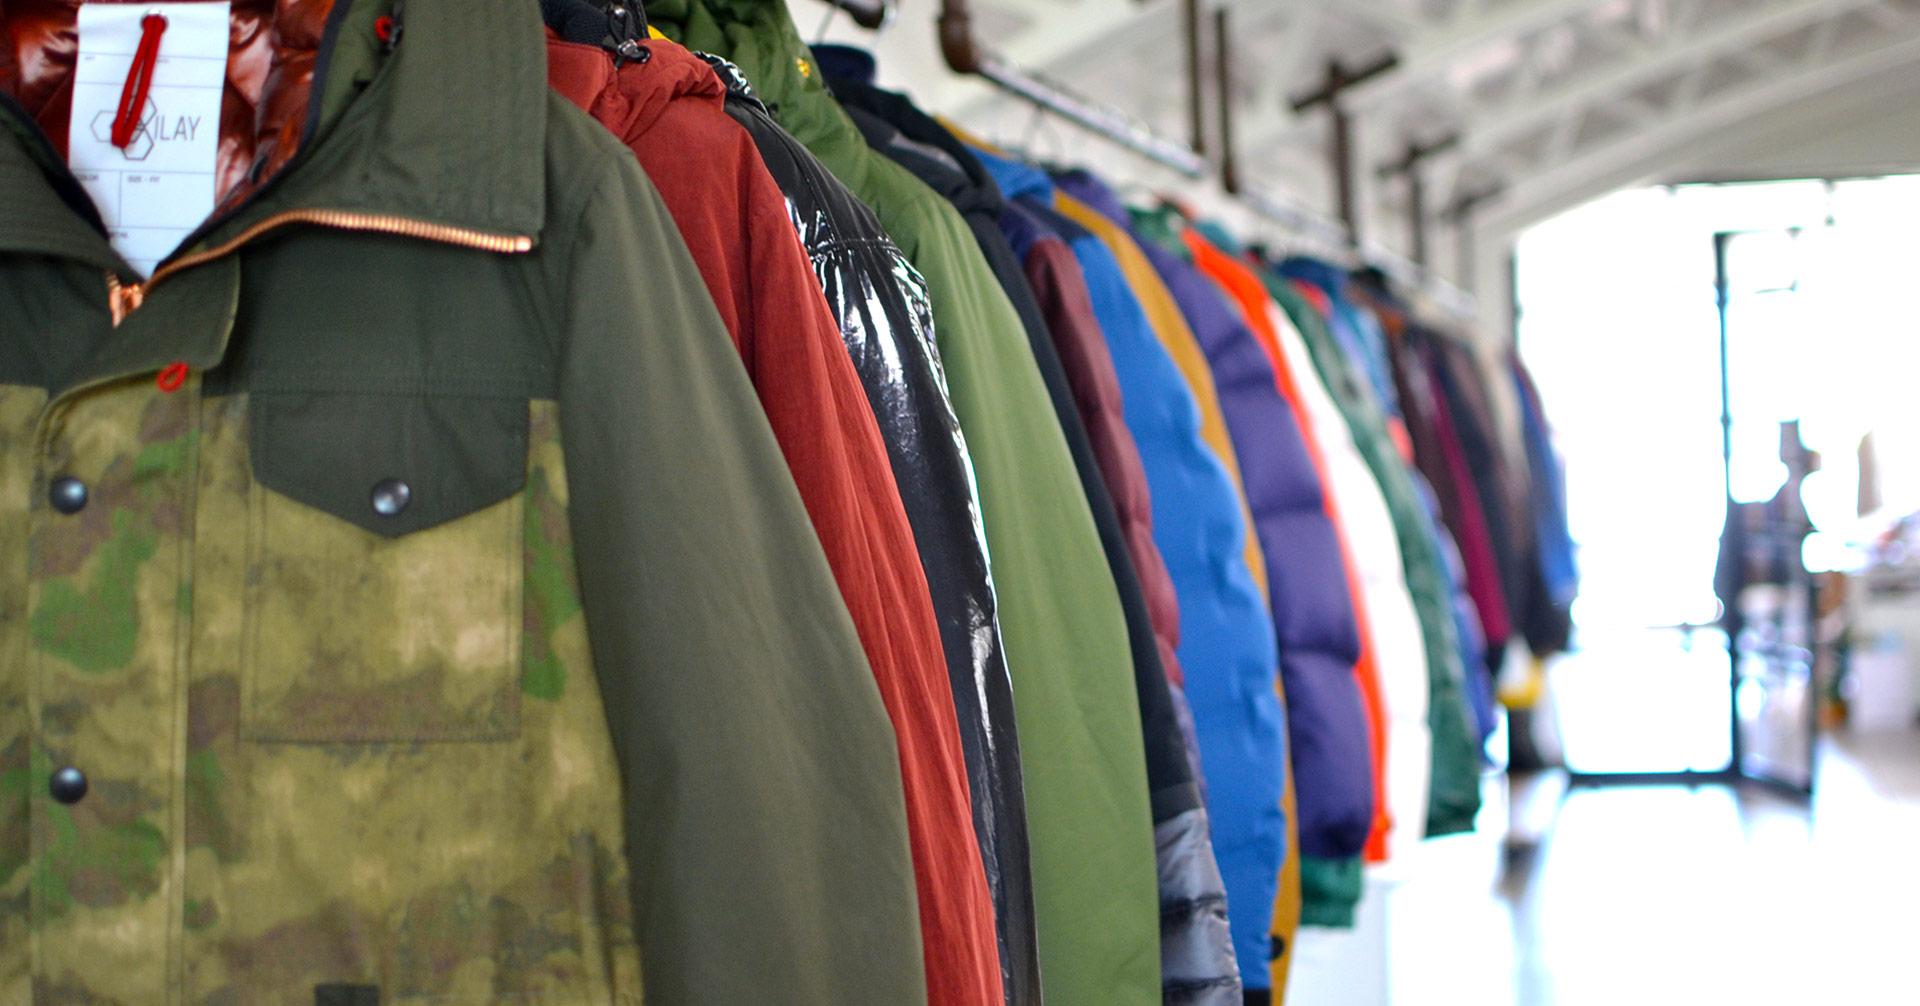 madexsrl_garment-abbigliamento-001